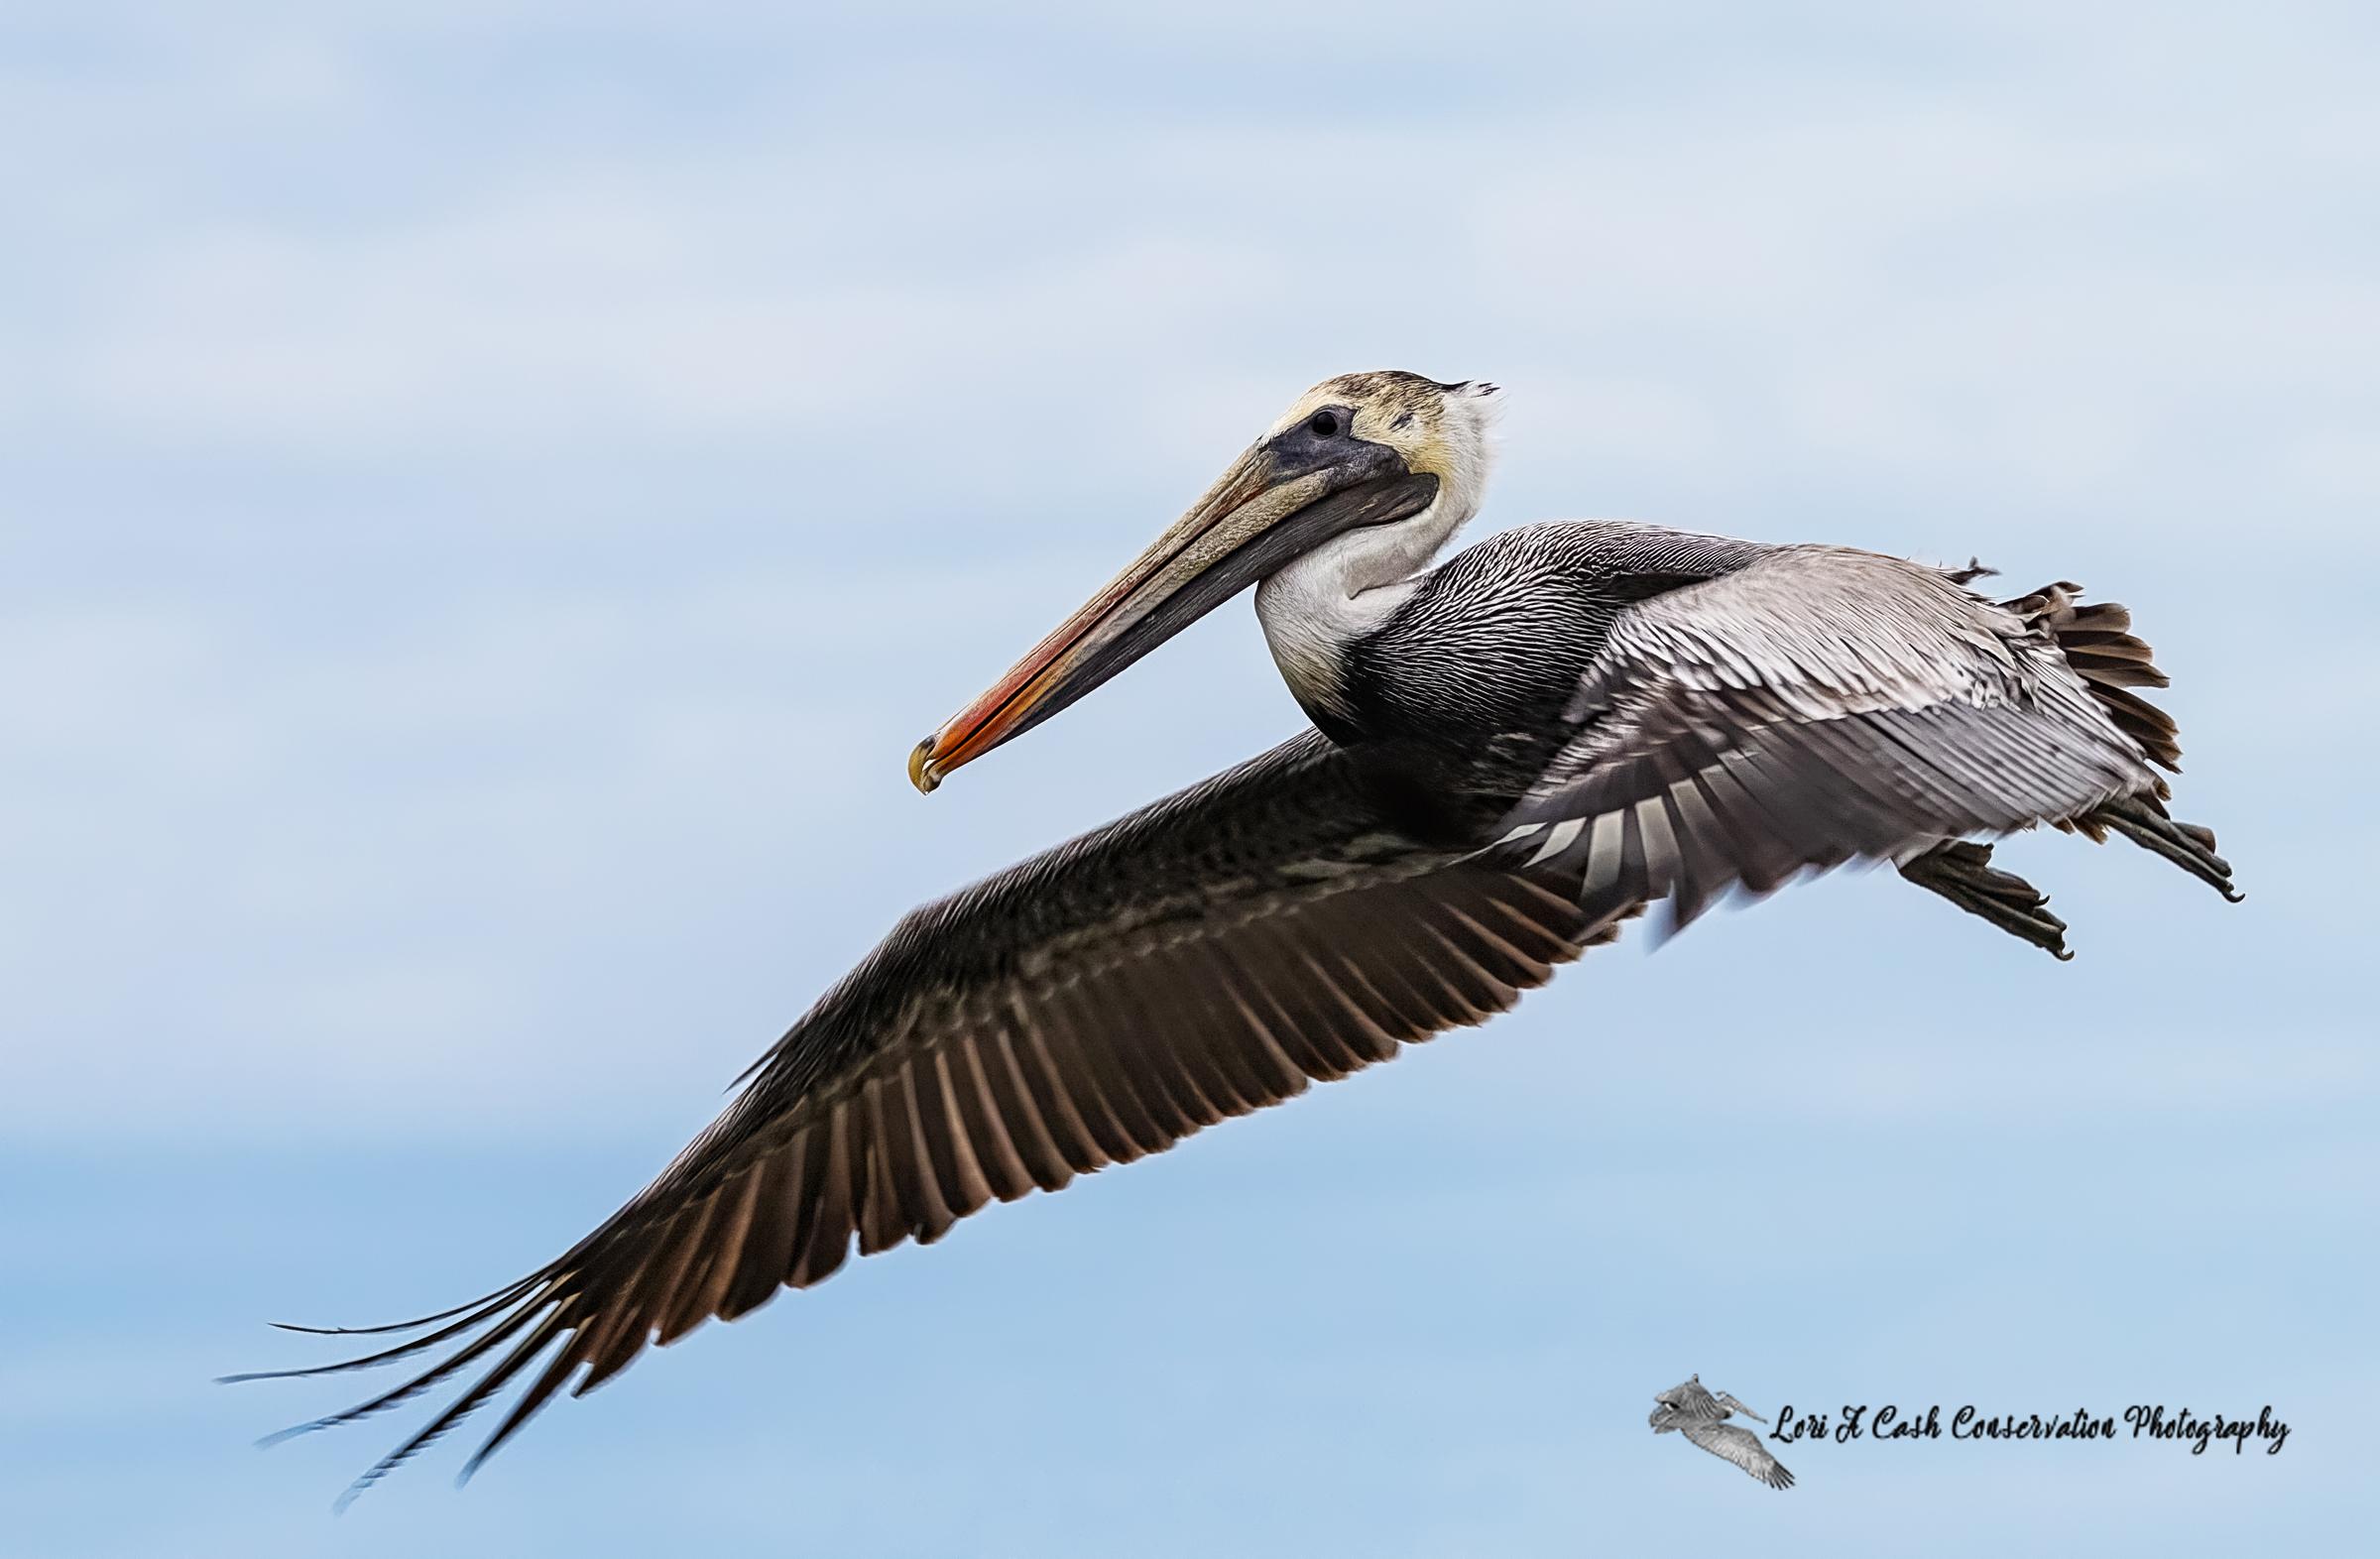 Brown pelican flying and soaring in the blue skies above the pilings in Mill Creek at Phoebus Waterfront Park in Hampton, Virginia.